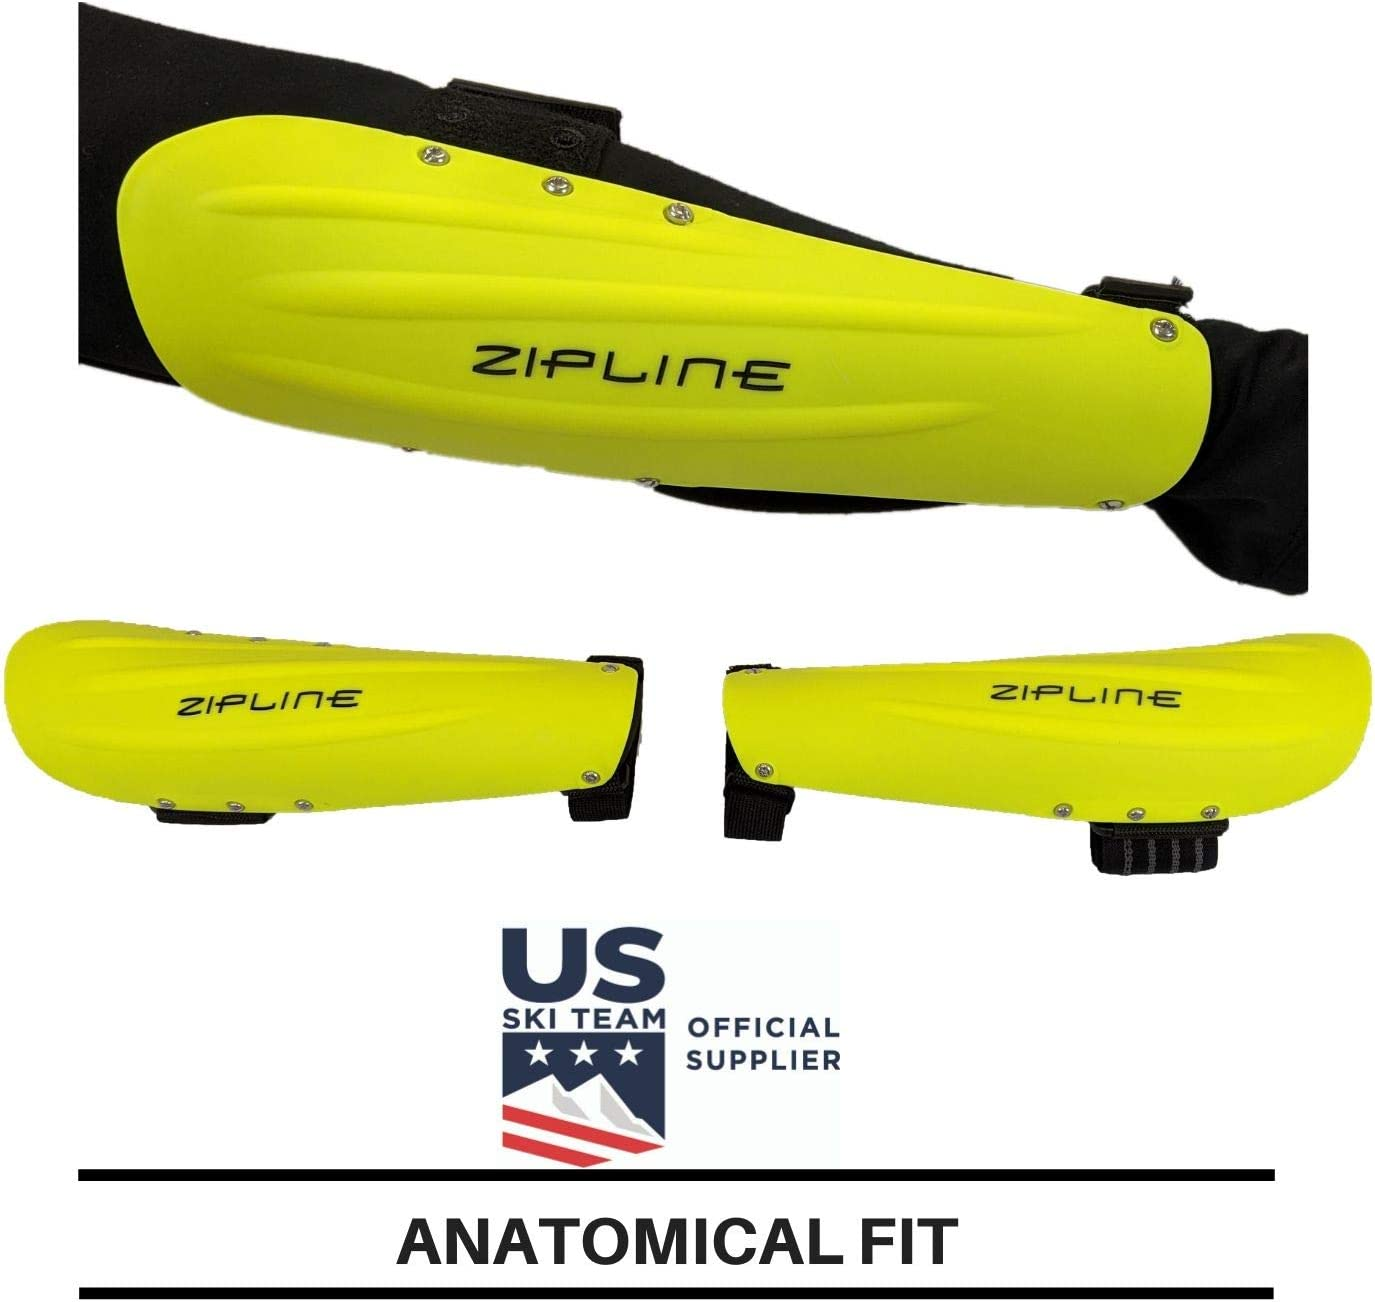 Zipline Ski Racing Forearm Guard Protector US Ski Team Official Supplier